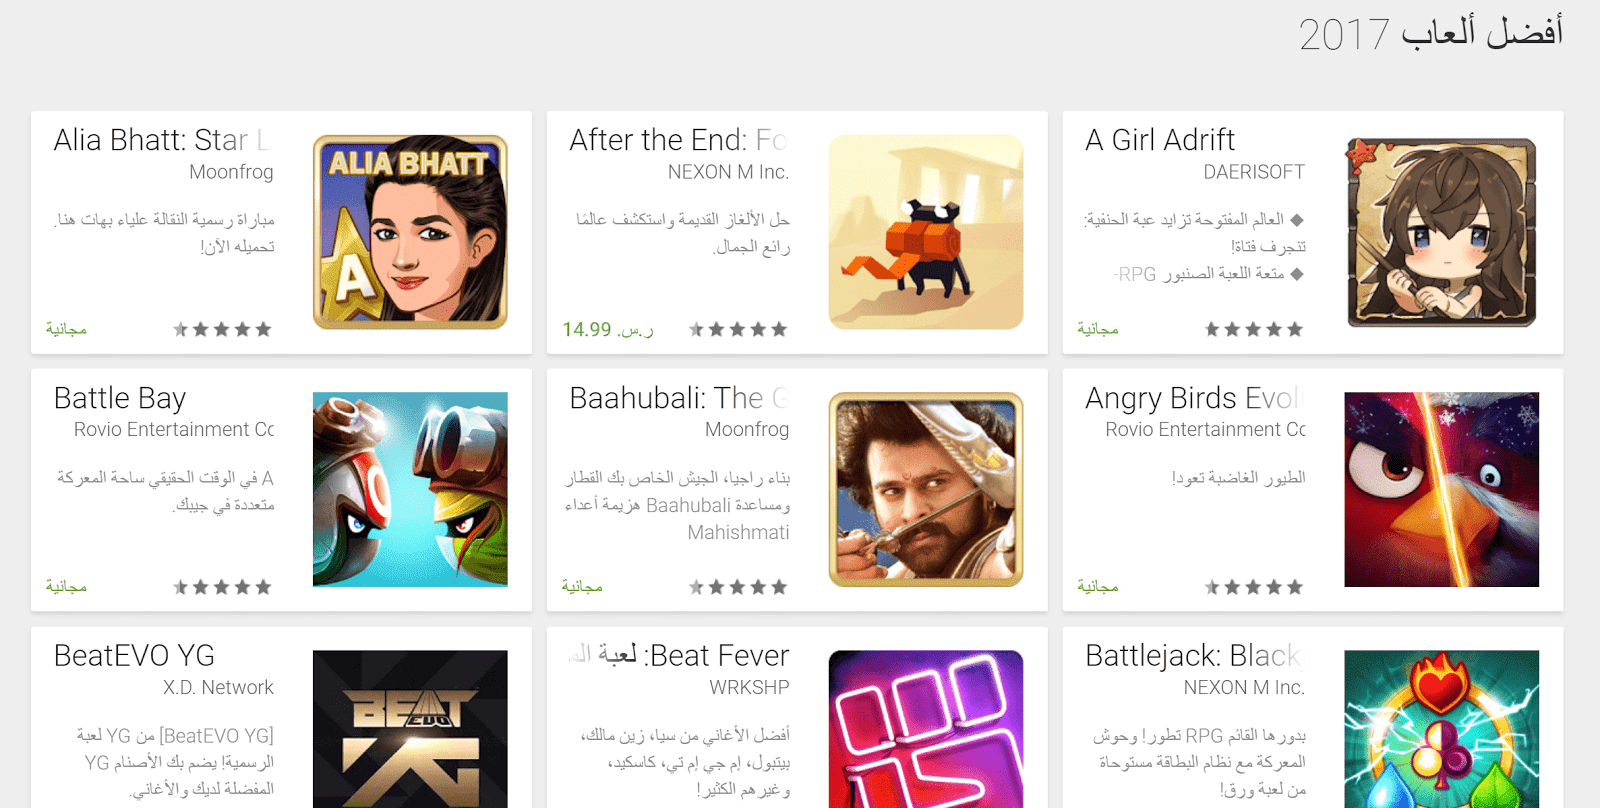 5394193c5 افضل التطبيقات والالعاب في متجر جوجل بلاي لسنة 2017